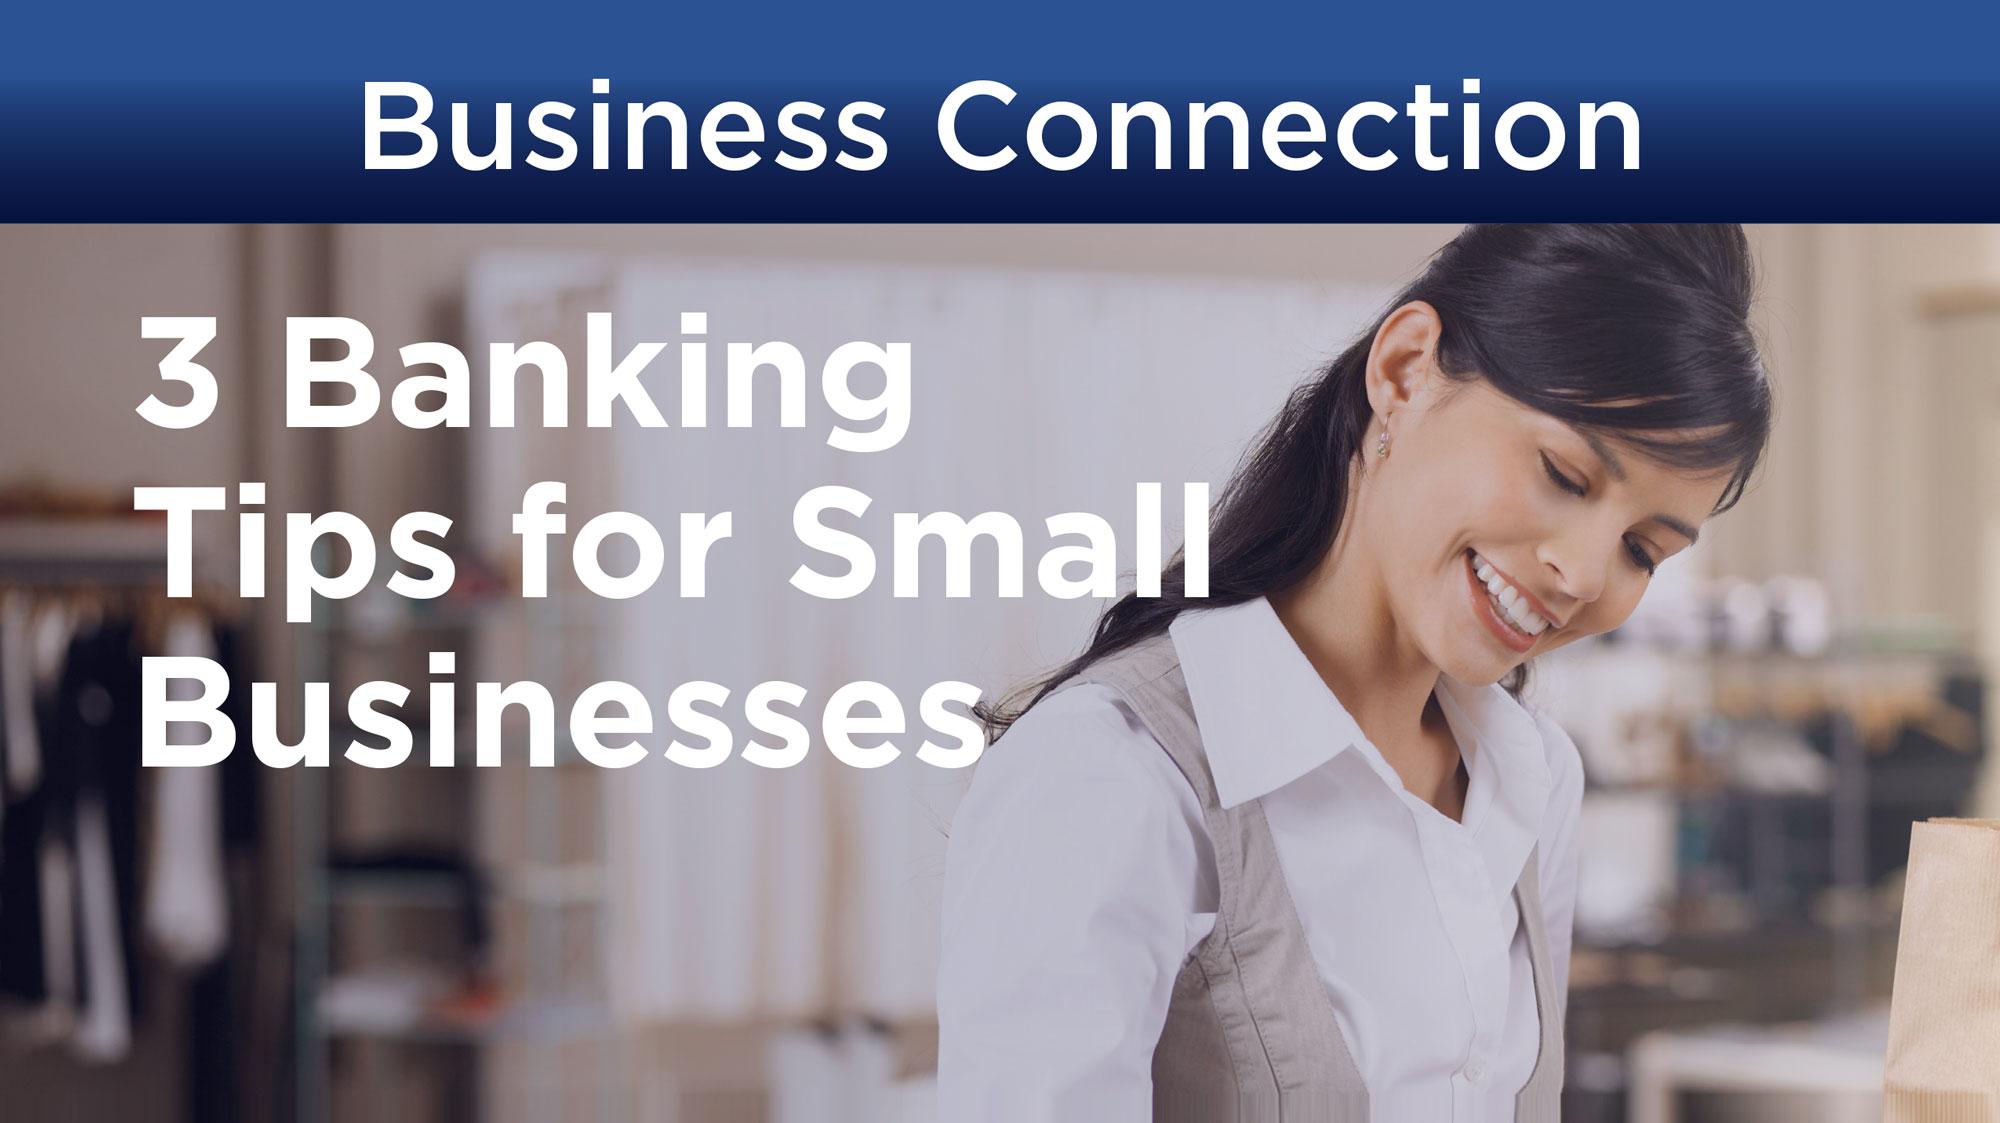 BusinessConnection-3BankingTips-Newsletter-SpencerSavingsBank.jpg